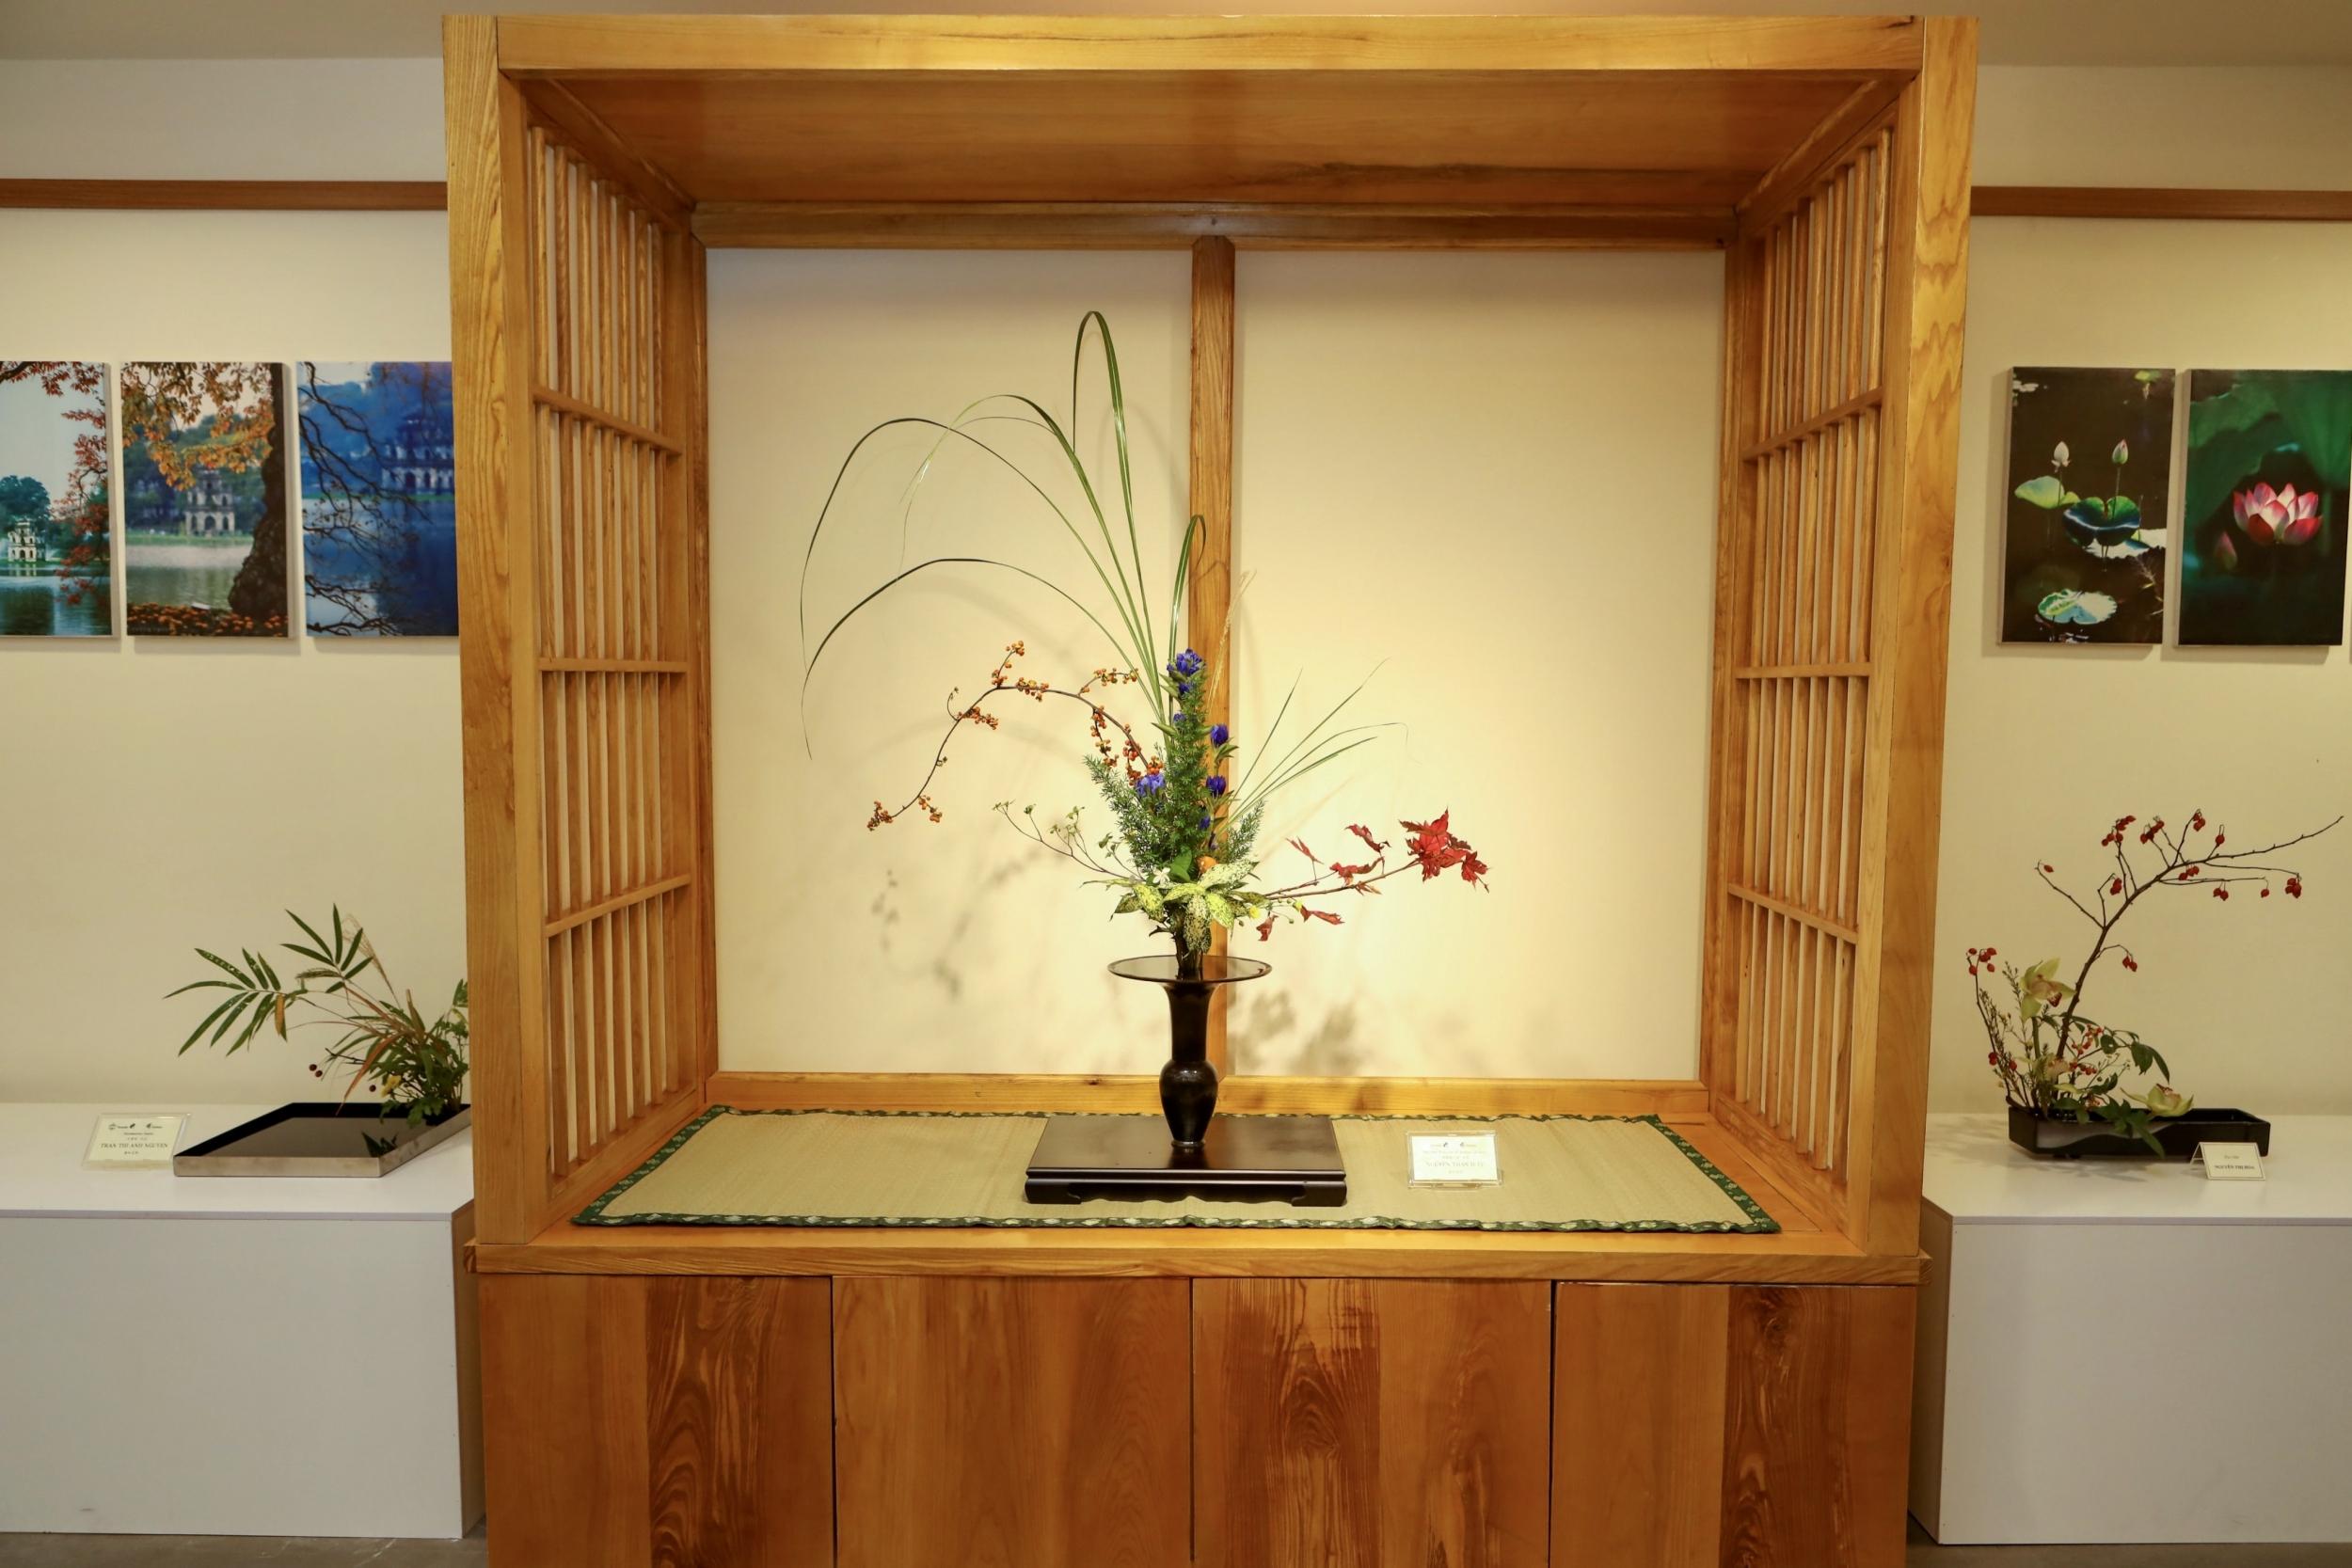 ra-mat-ikebana-house-khong-gian-nghe-thuat-ikebana-dau-tien-tai-viet-nam-1